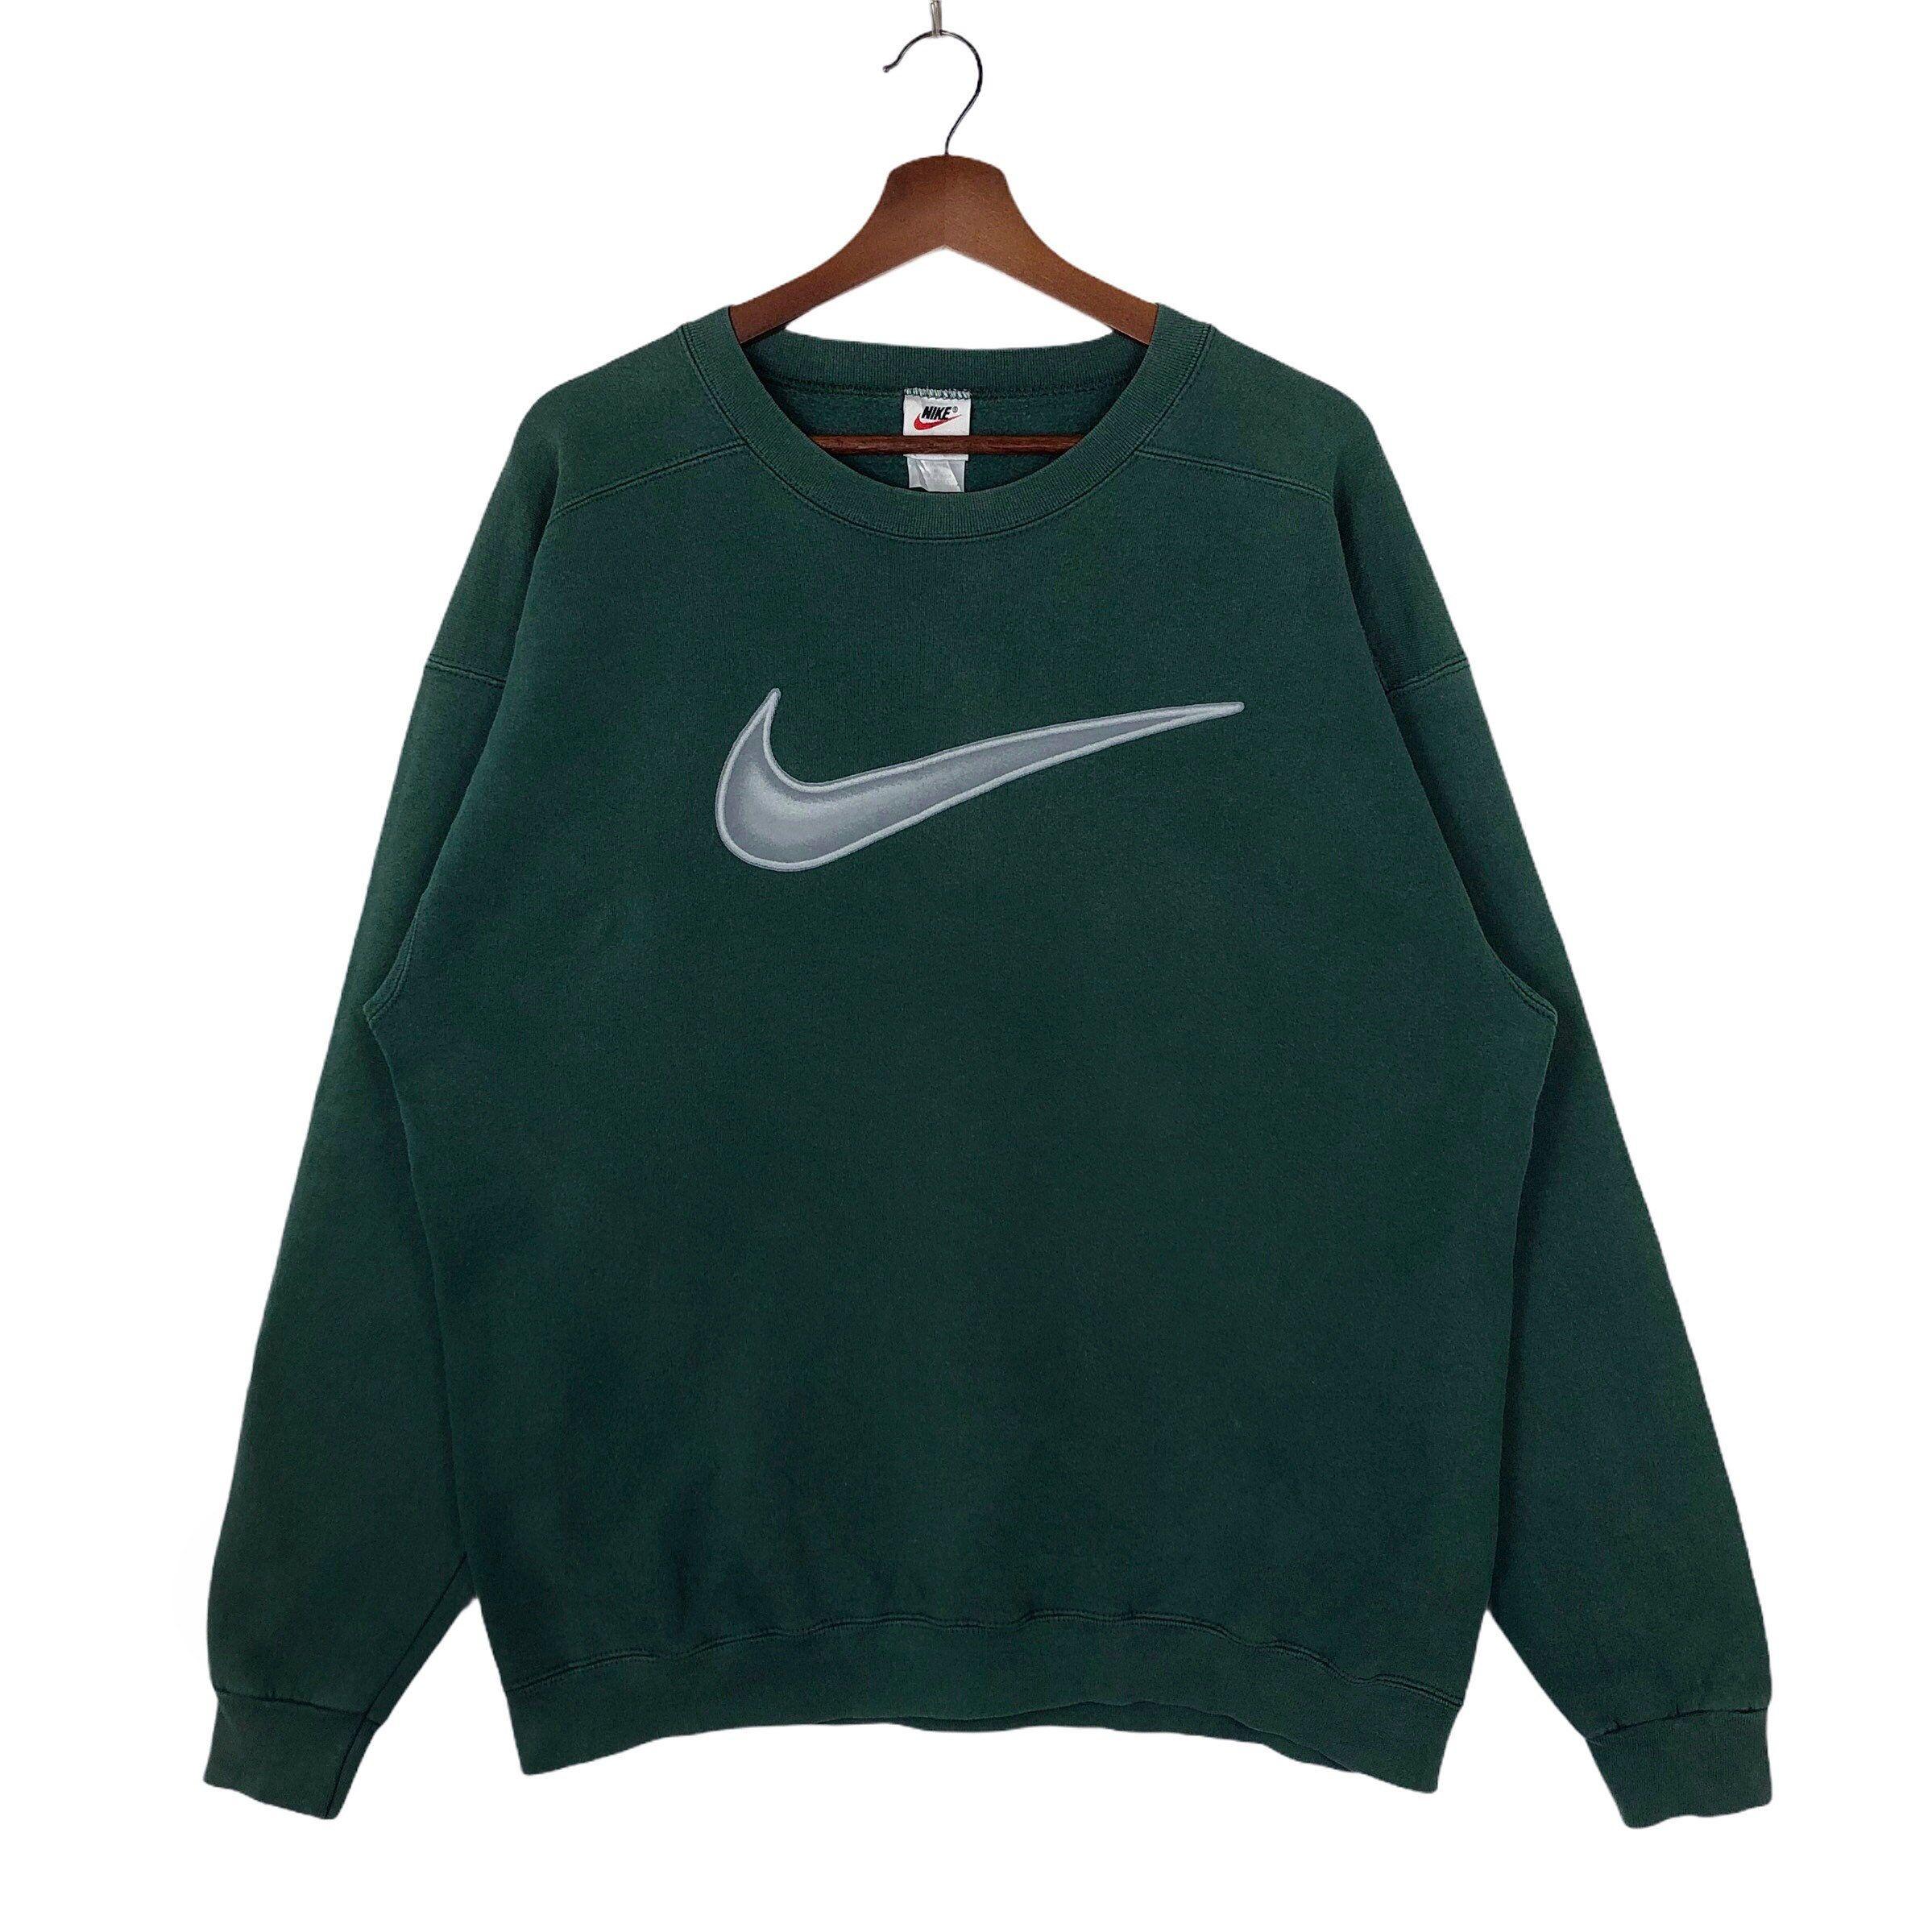 Predownload: Vintage Green Nike Sweatshirt Crewneck Neon Nike Swoosh Big Logo Nike Vintage Sweatshirt Pullover Jumper Made In Usa Vintage Sweatshirt Vintage Nike Sweatshirt Sweatshirts [ 2398 x 2398 Pixel ]